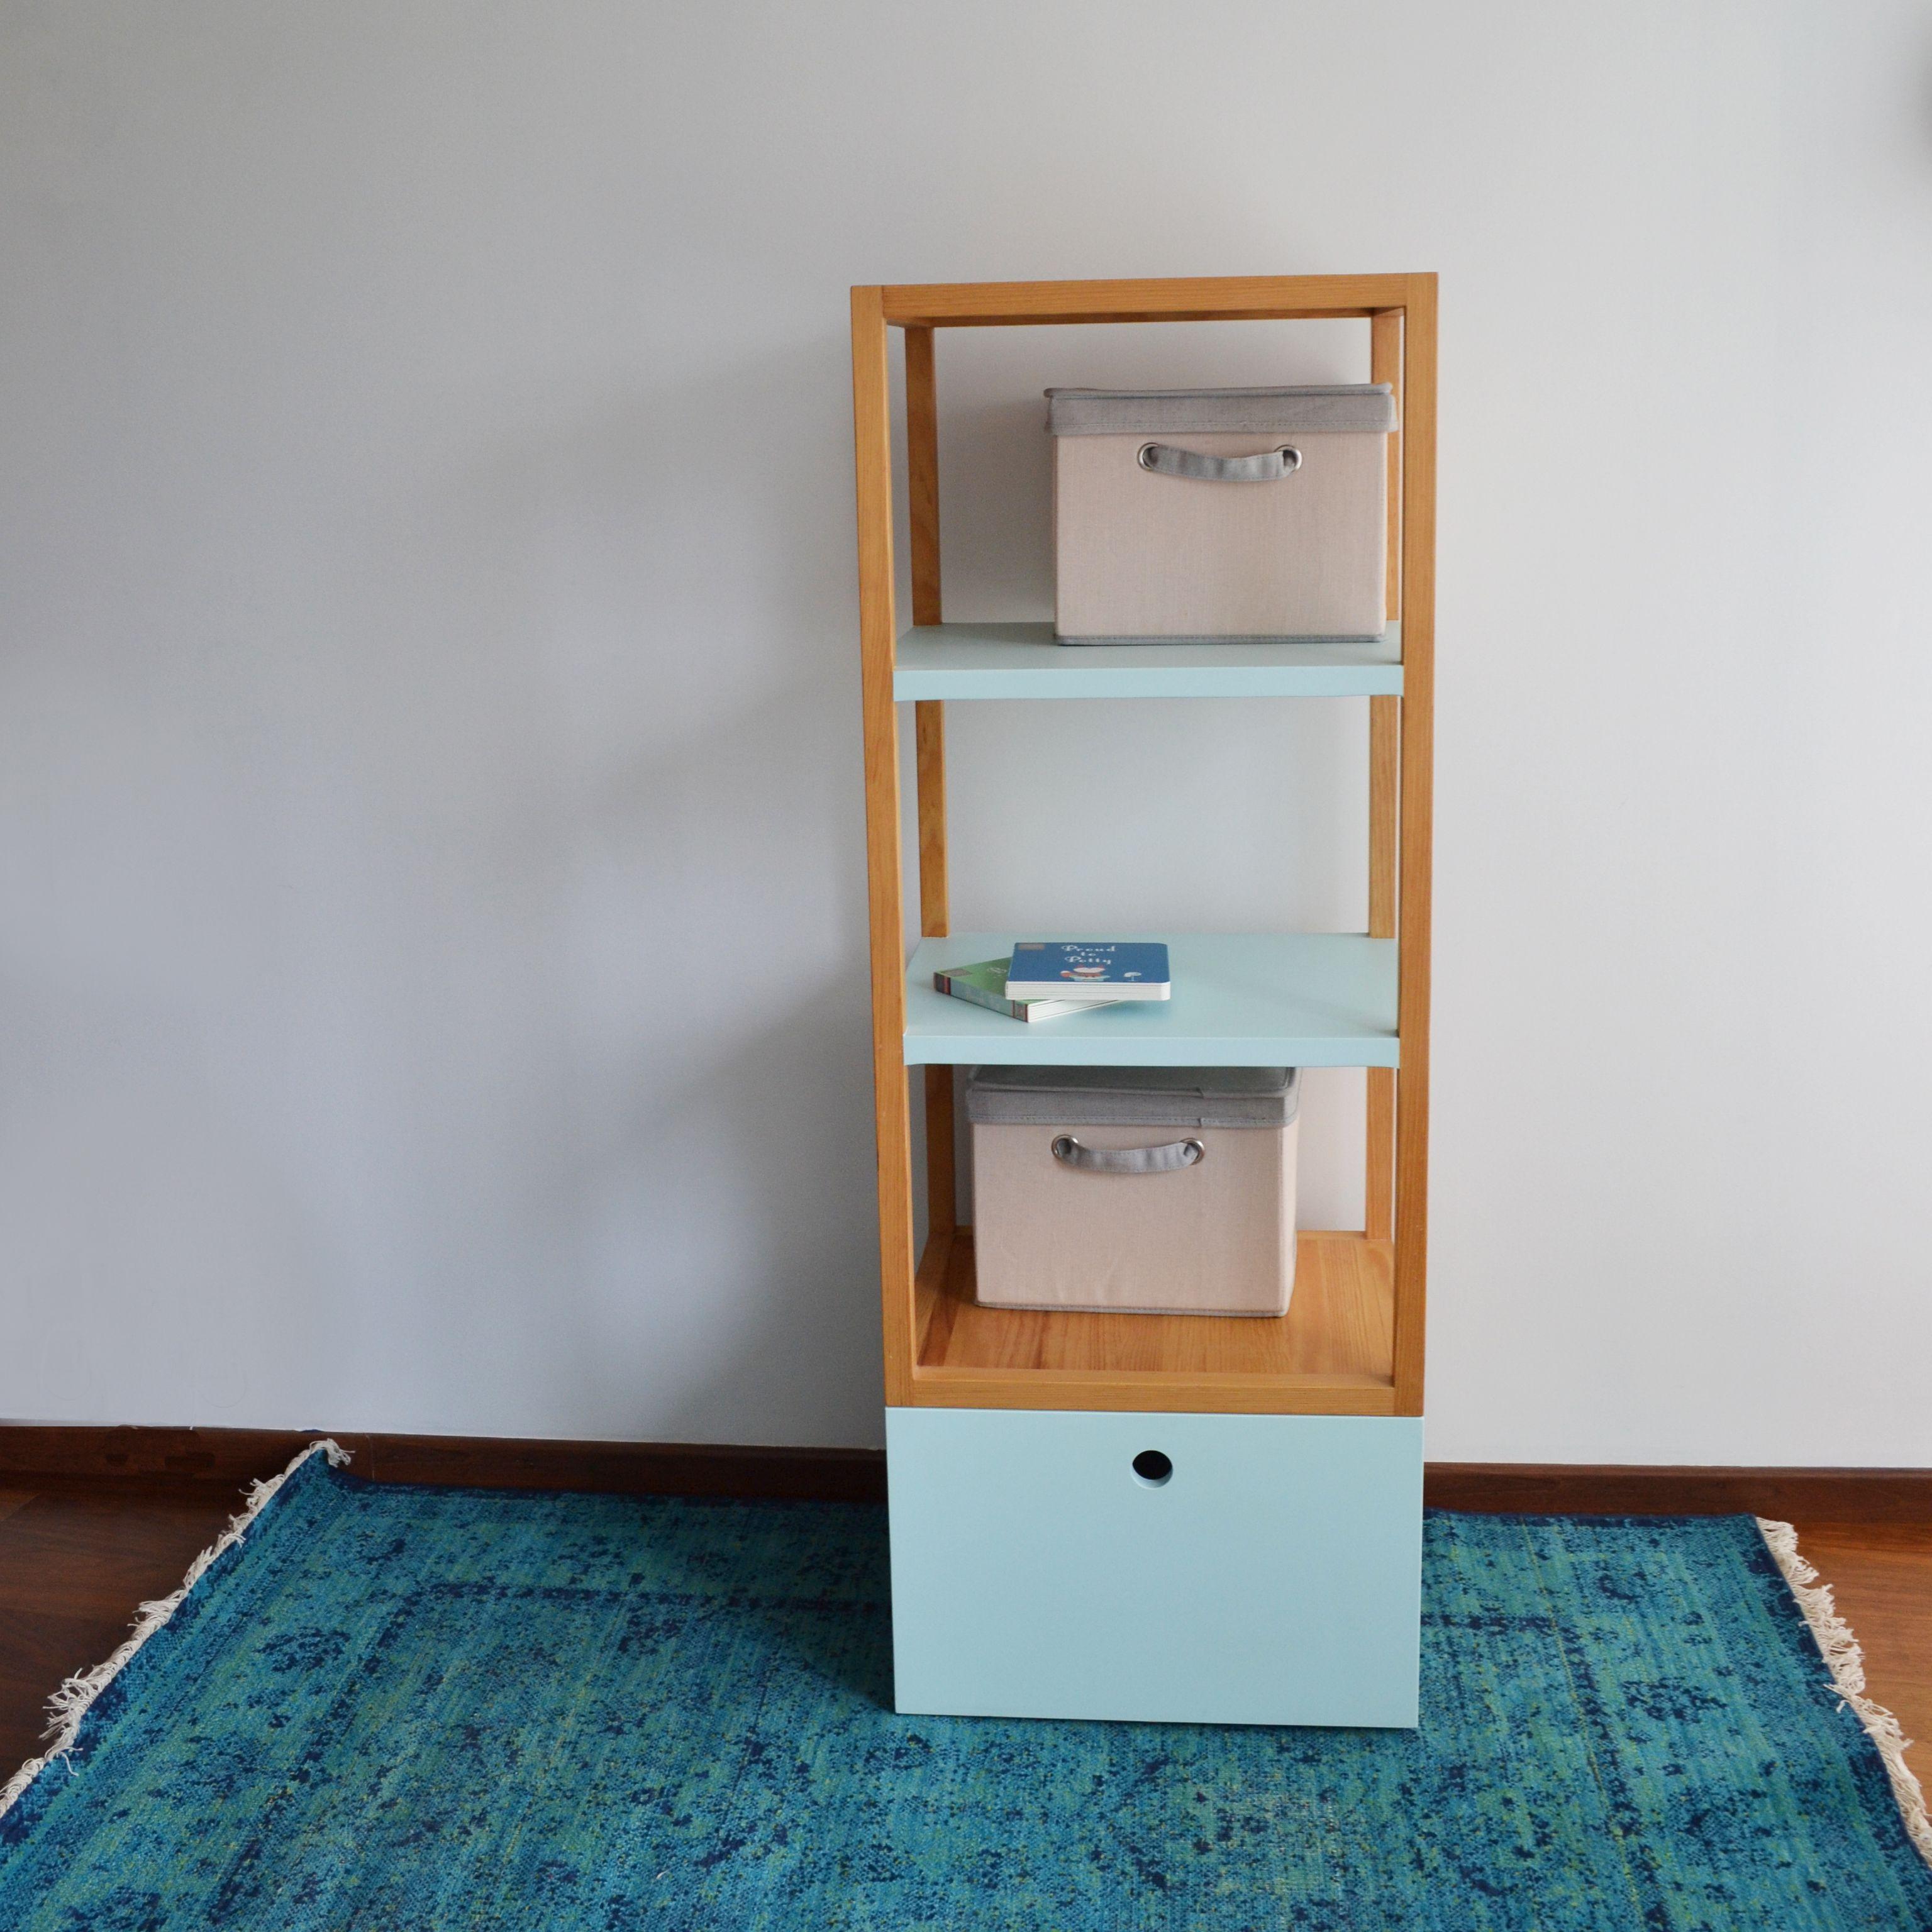 Ak N Hecho En M Xico Dise O Para Ni Os Kids Design Mobiliario  # Muebles Jugueteros Para Ninos